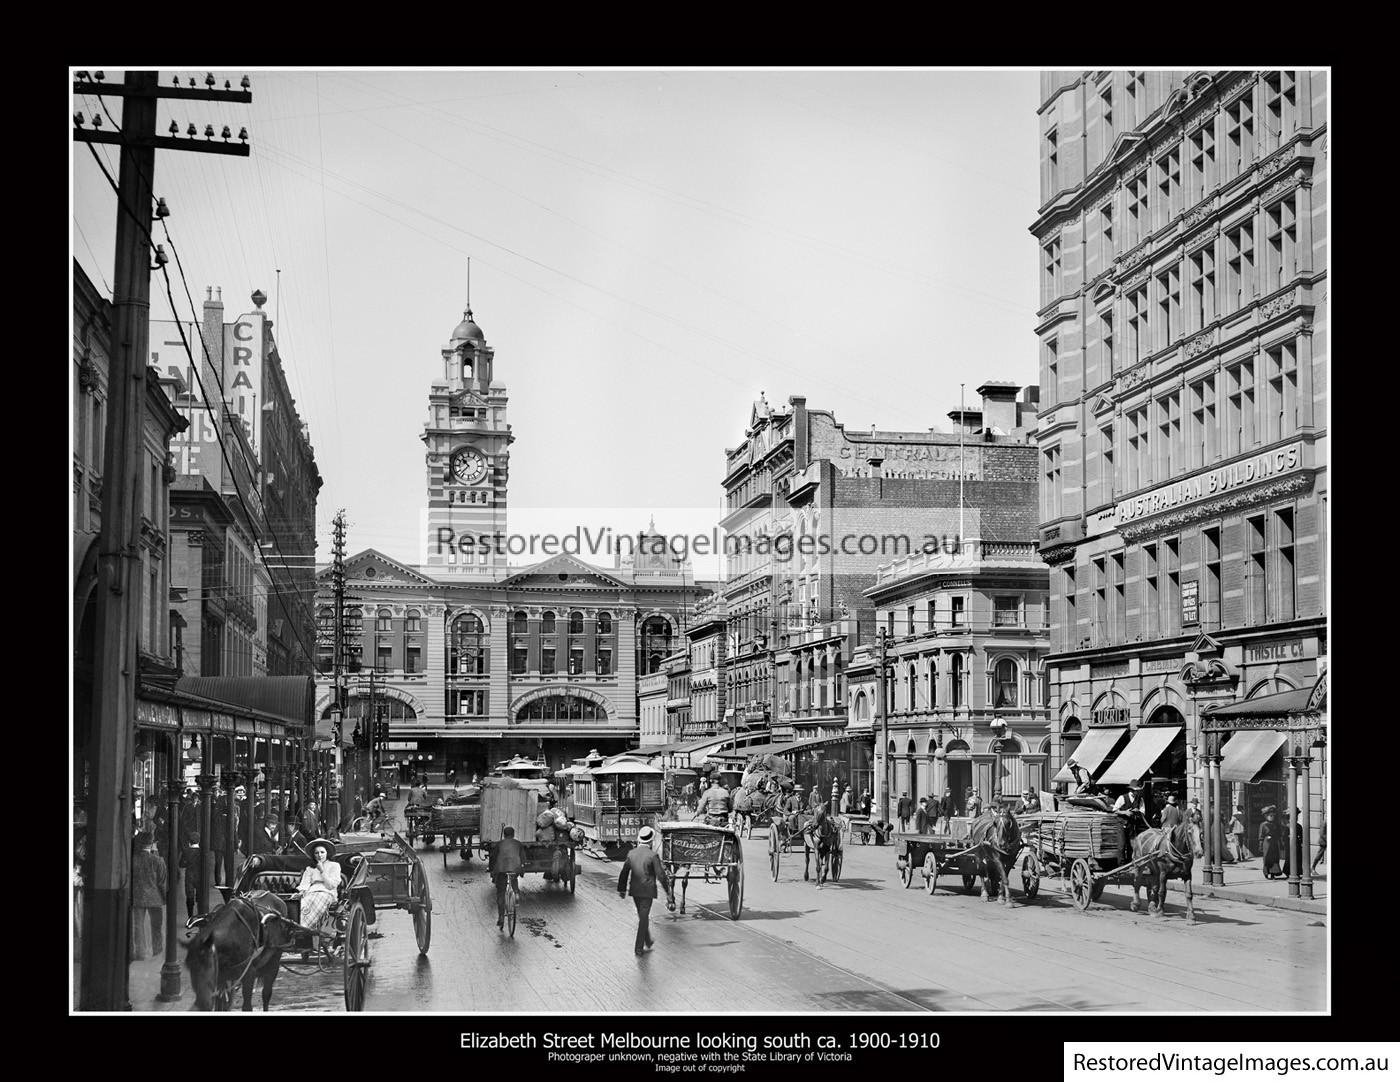 Elizabeth Street Melbourne Looking South Ca. 1900-1910